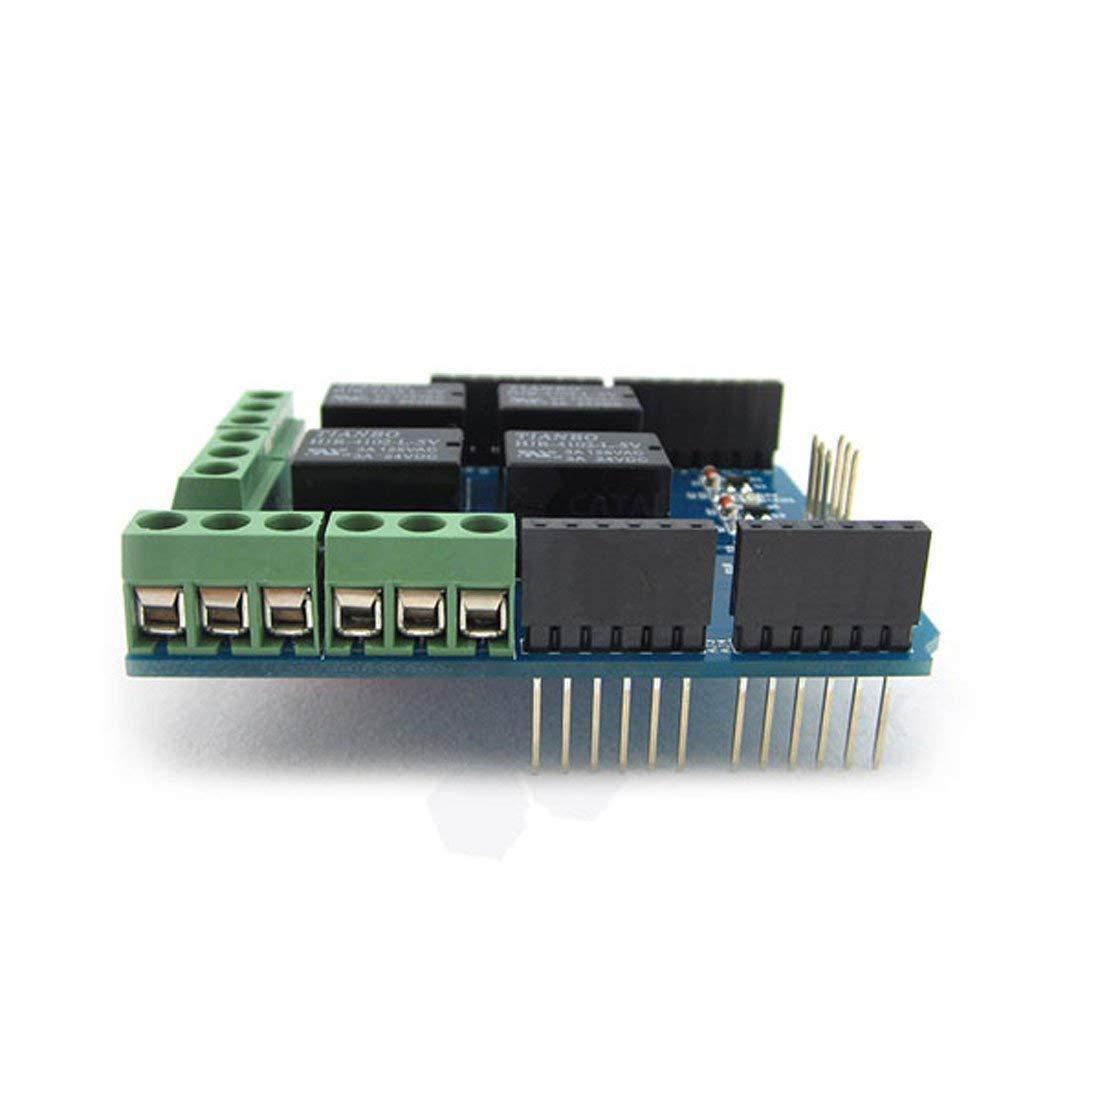 Relay Shield 5V 4 Channel Arduino UNO R3 Relay Shield Arduino Shield